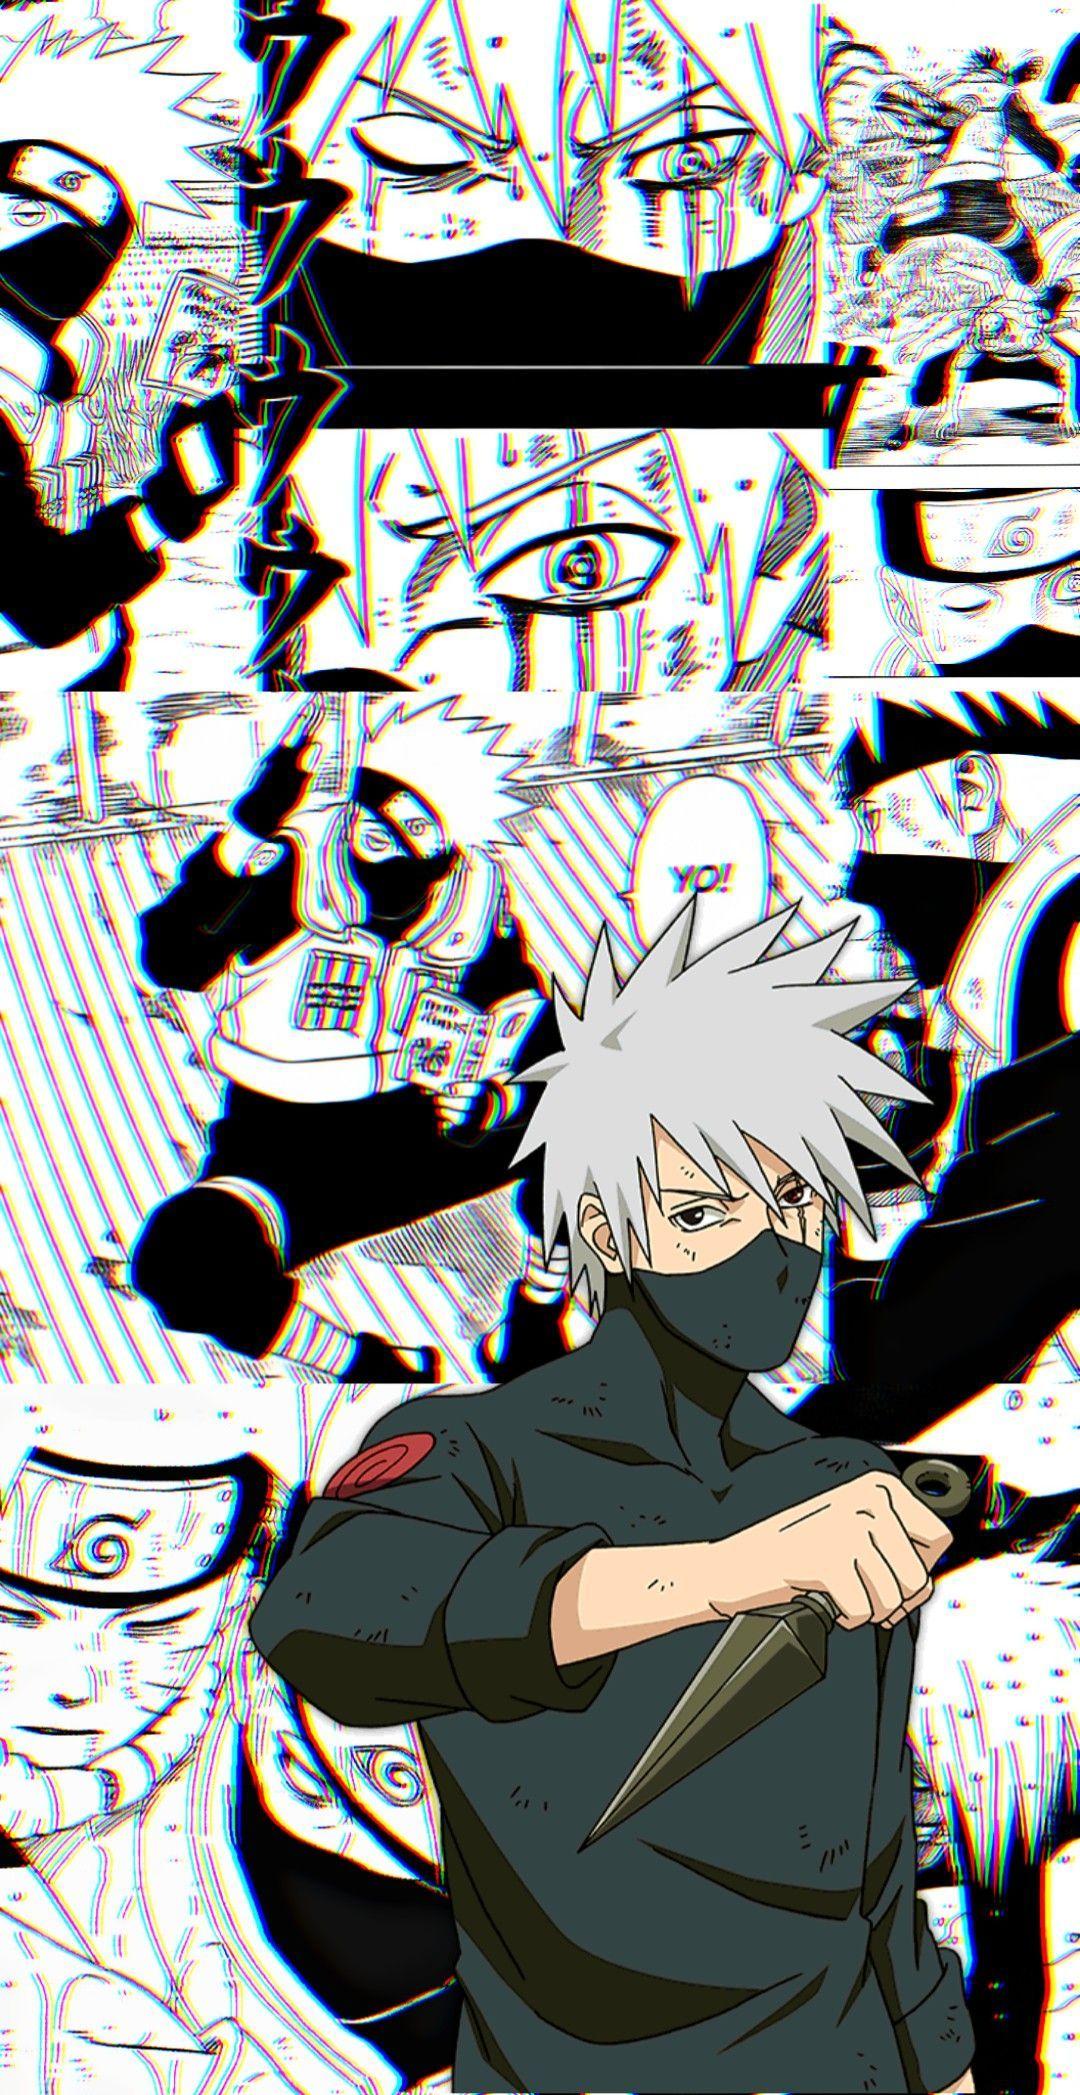 Hotkey Kakshi Em 2020 Naruto E Sasuke Desenho Animes Wallpapers Personagens De Anime